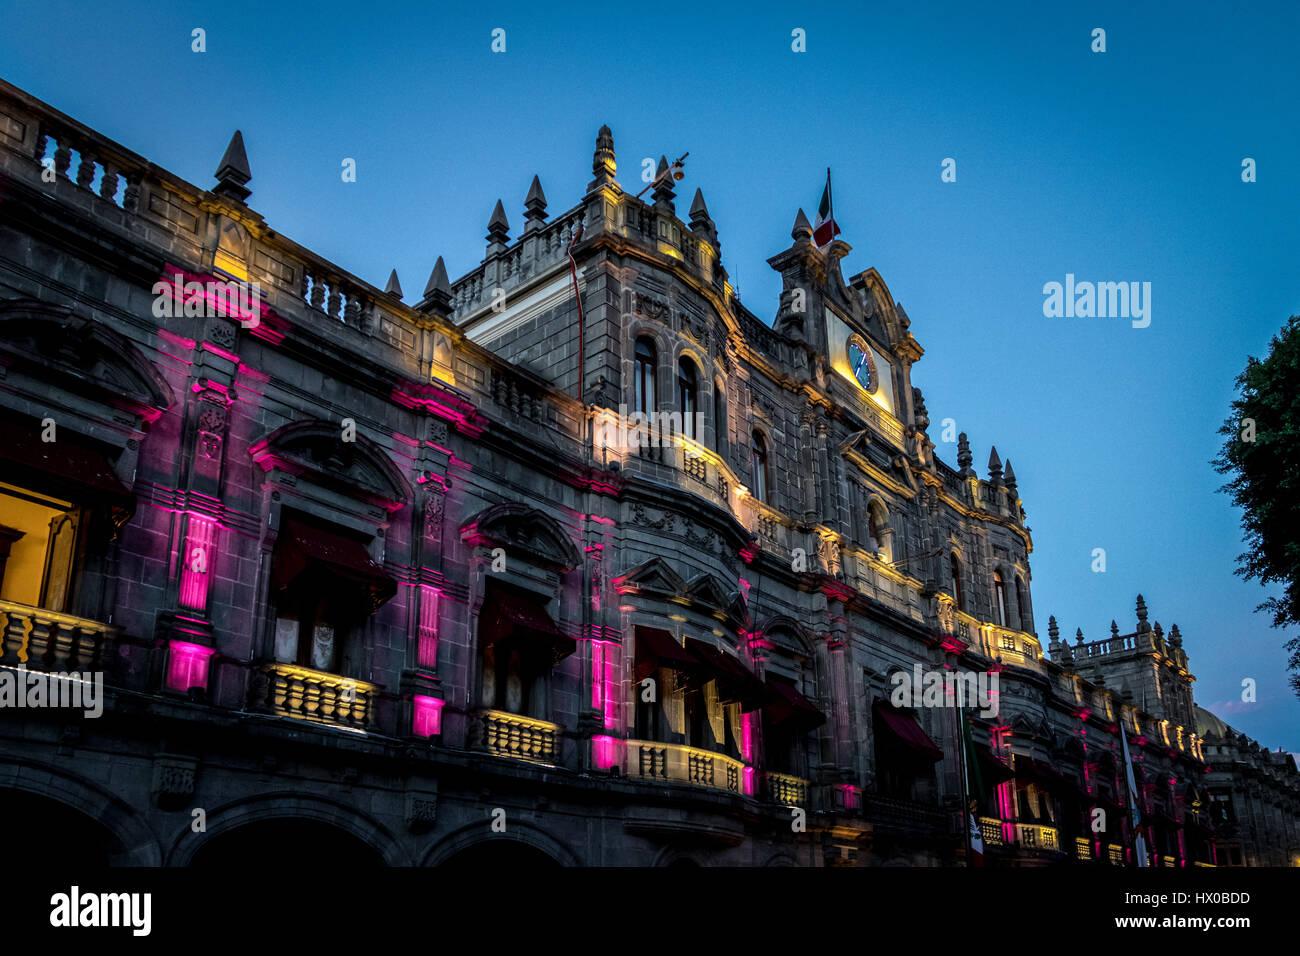 Municipal Palace at night - Puebla, Mexico - Stock Image